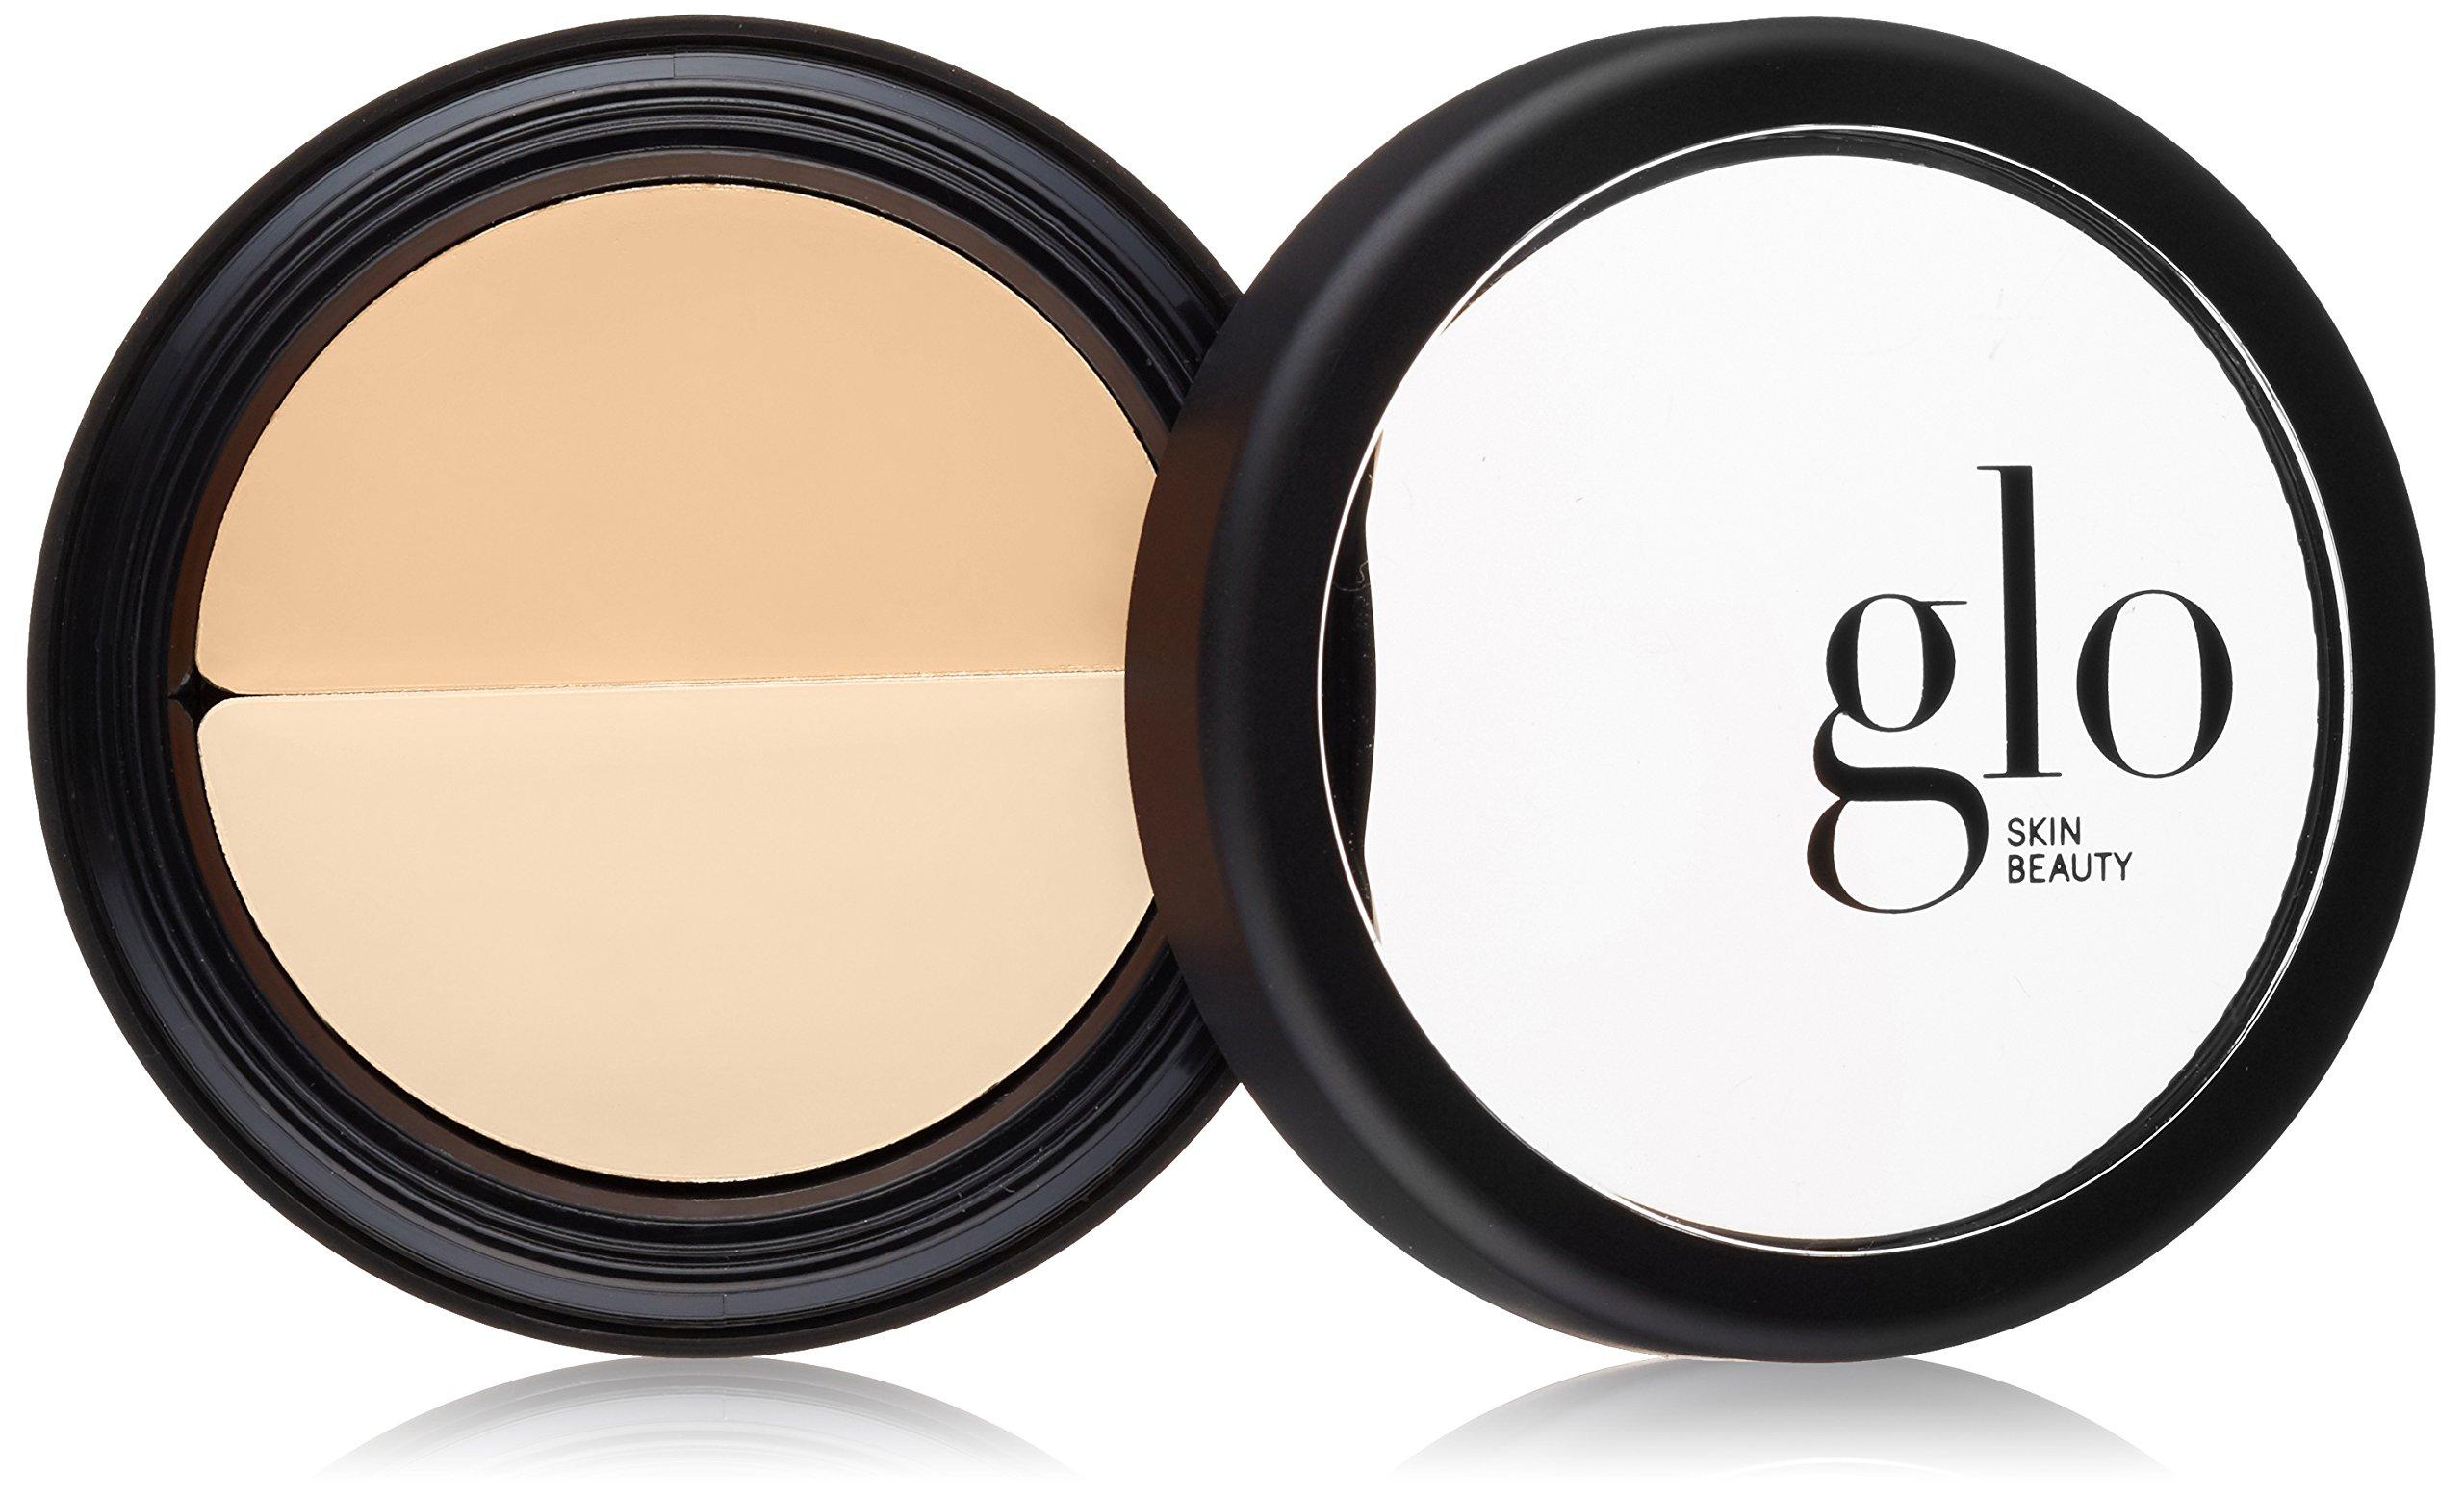 Glo Skin Beauty Under Eye Concealer - Golden - Mineral Makeup Concealer, 4 Shades | Cruelty Free